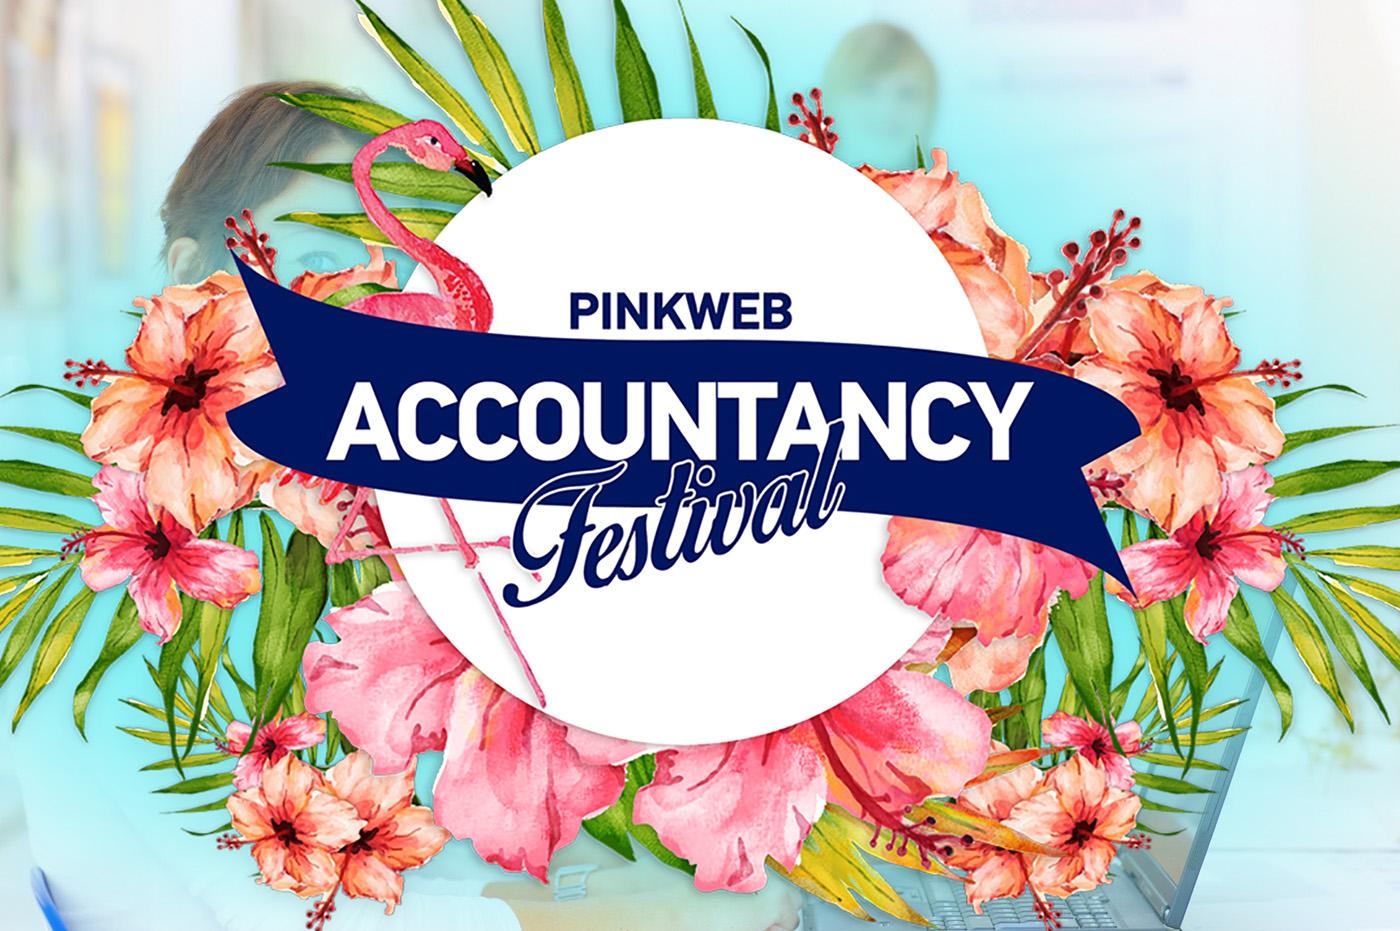 Pinkweb festival